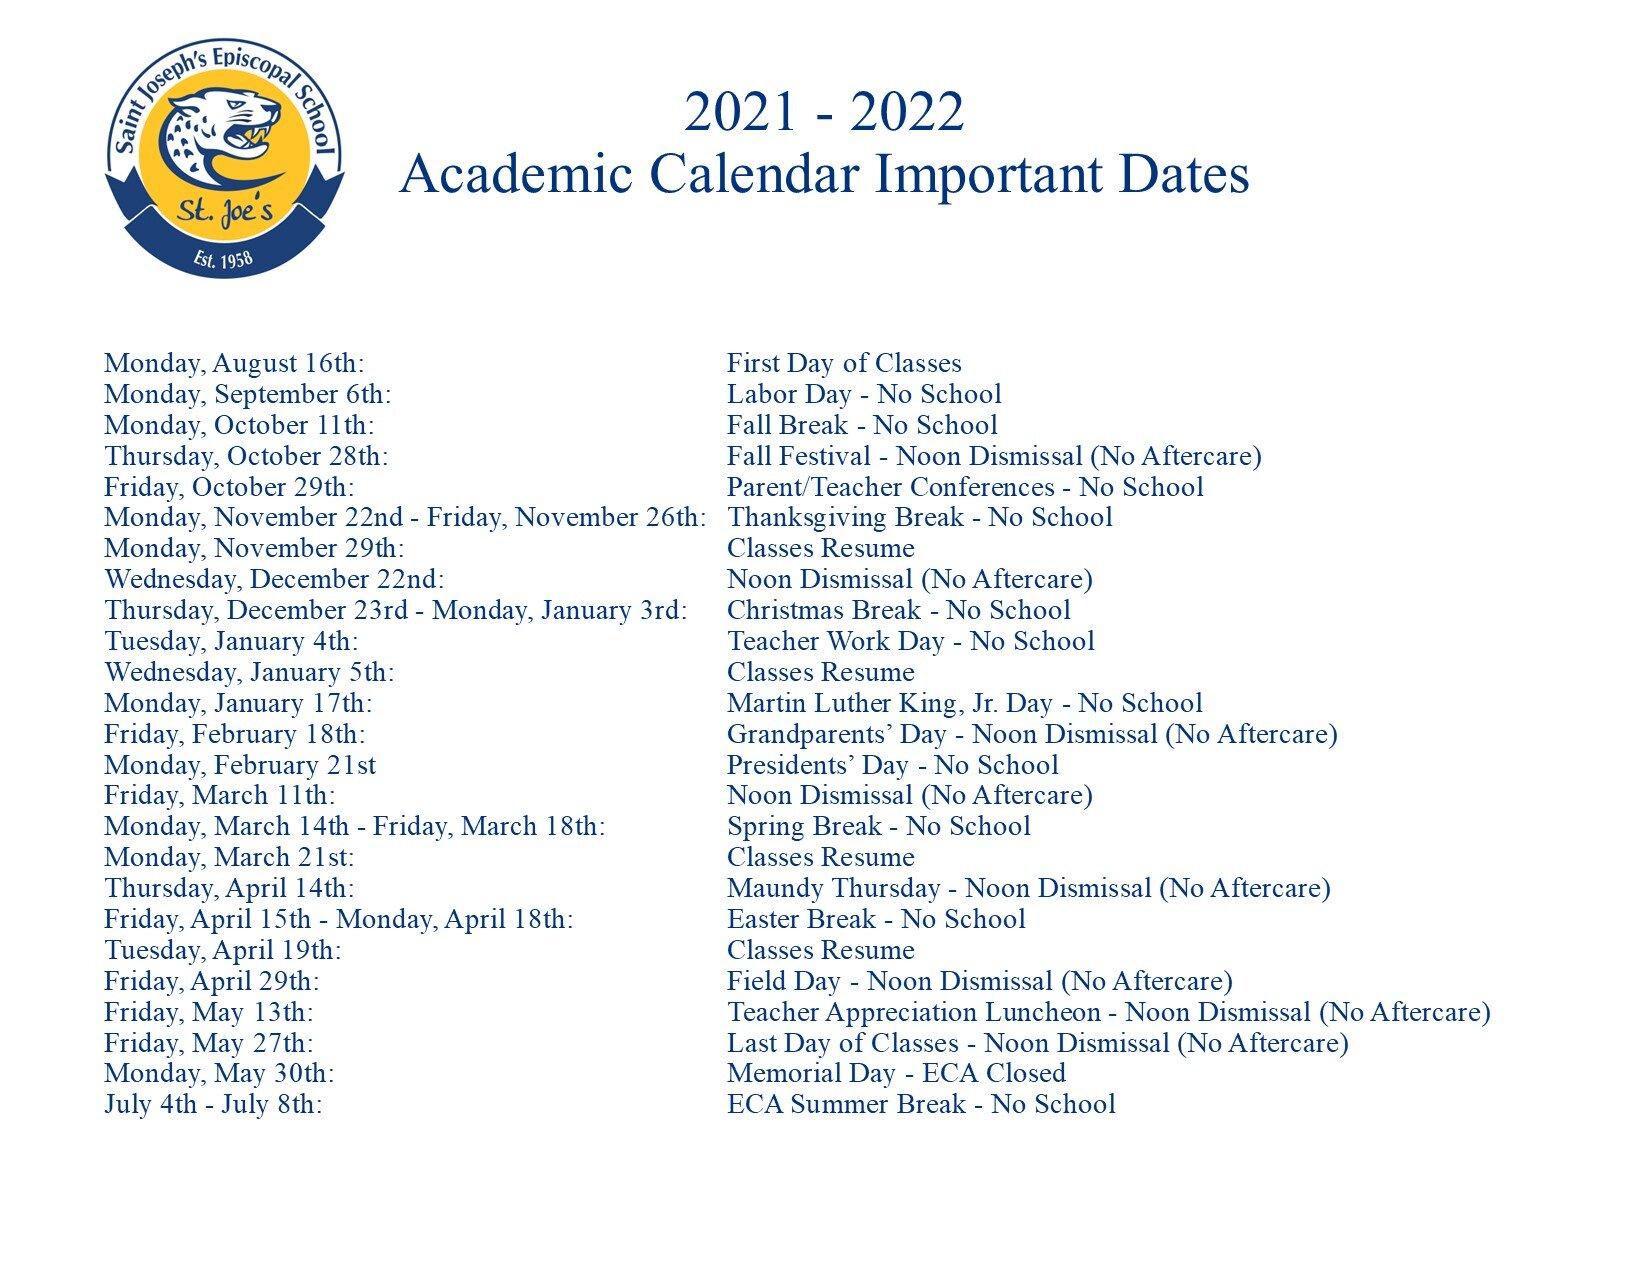 Fiu Spring 2022 Calendar.Calendar Saint Joseph S Episcopal School